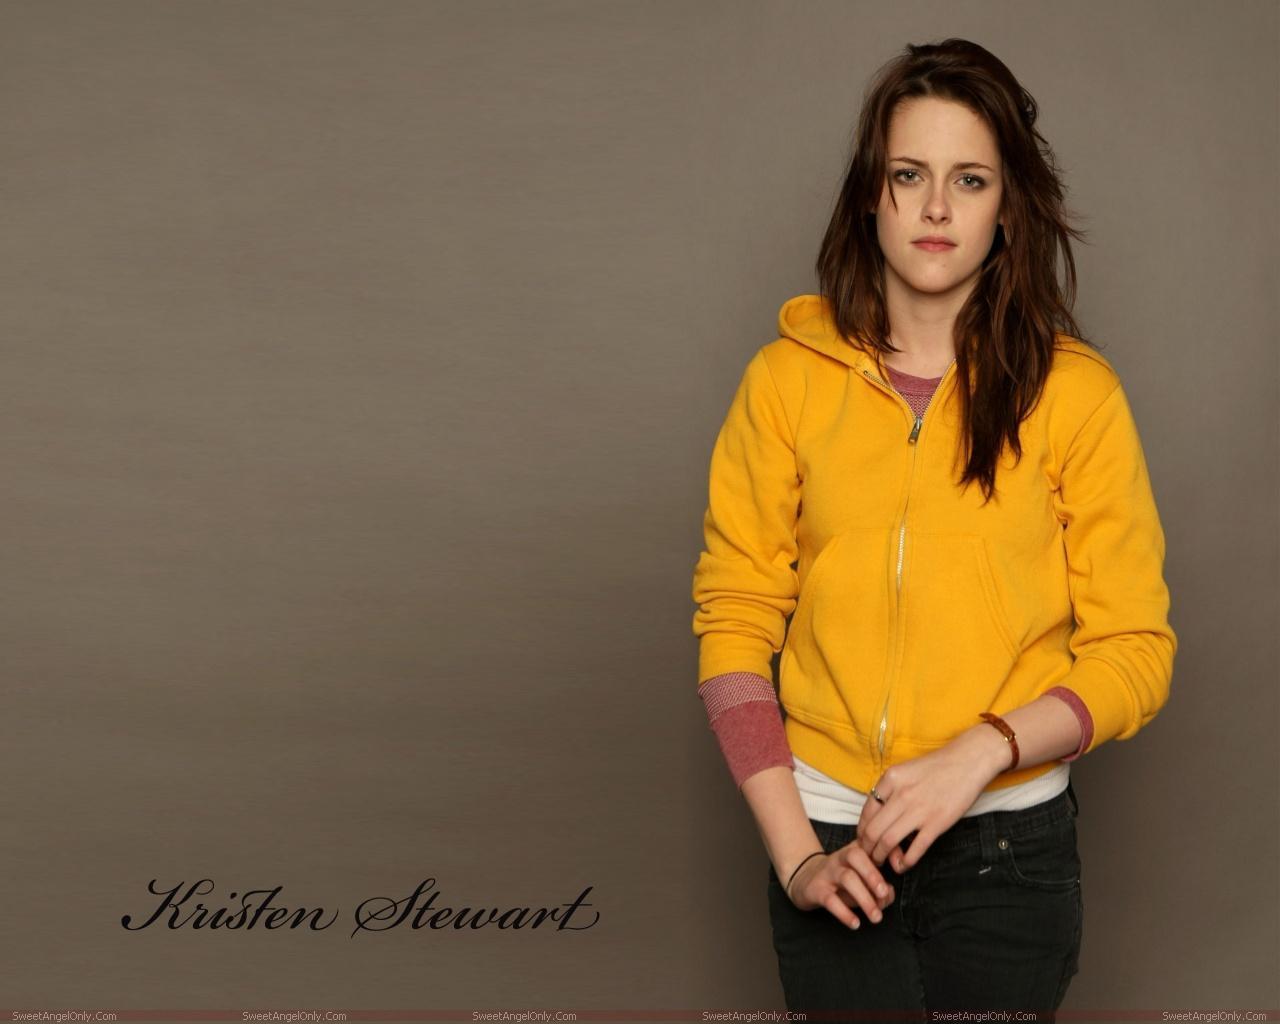 kristen stewart hollywood actress - photo #28